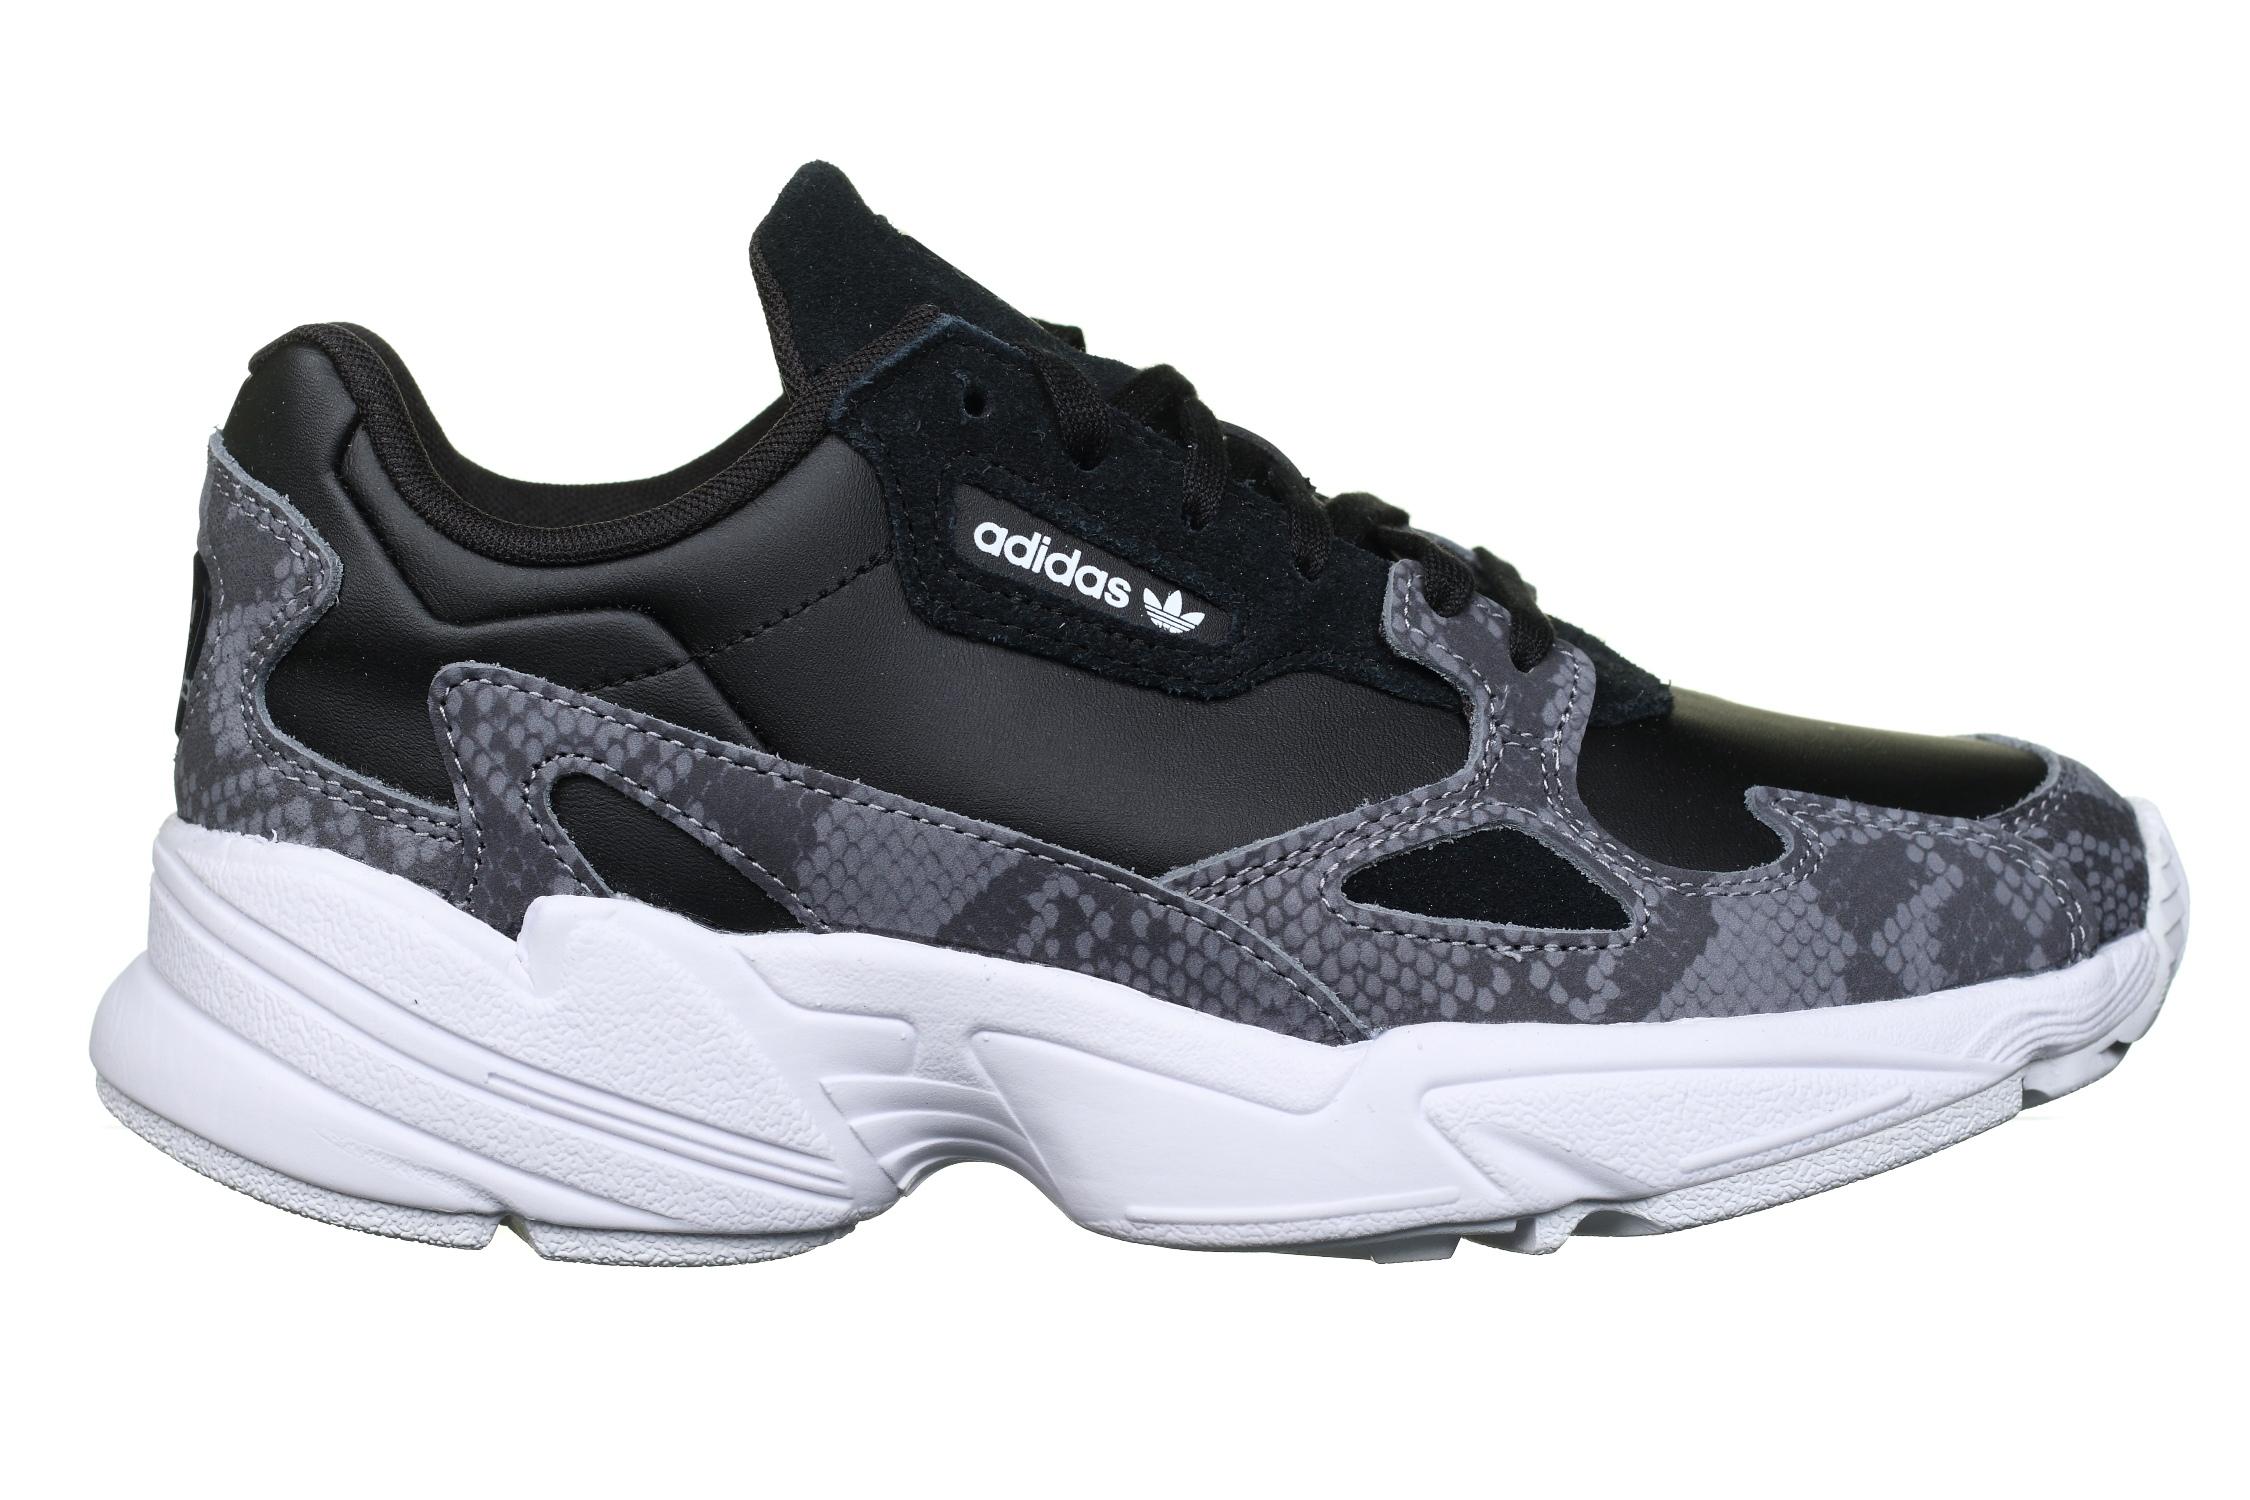 https://www.leadermode.com/190481/adidas-falcon-w-fv4483-noir.jpg